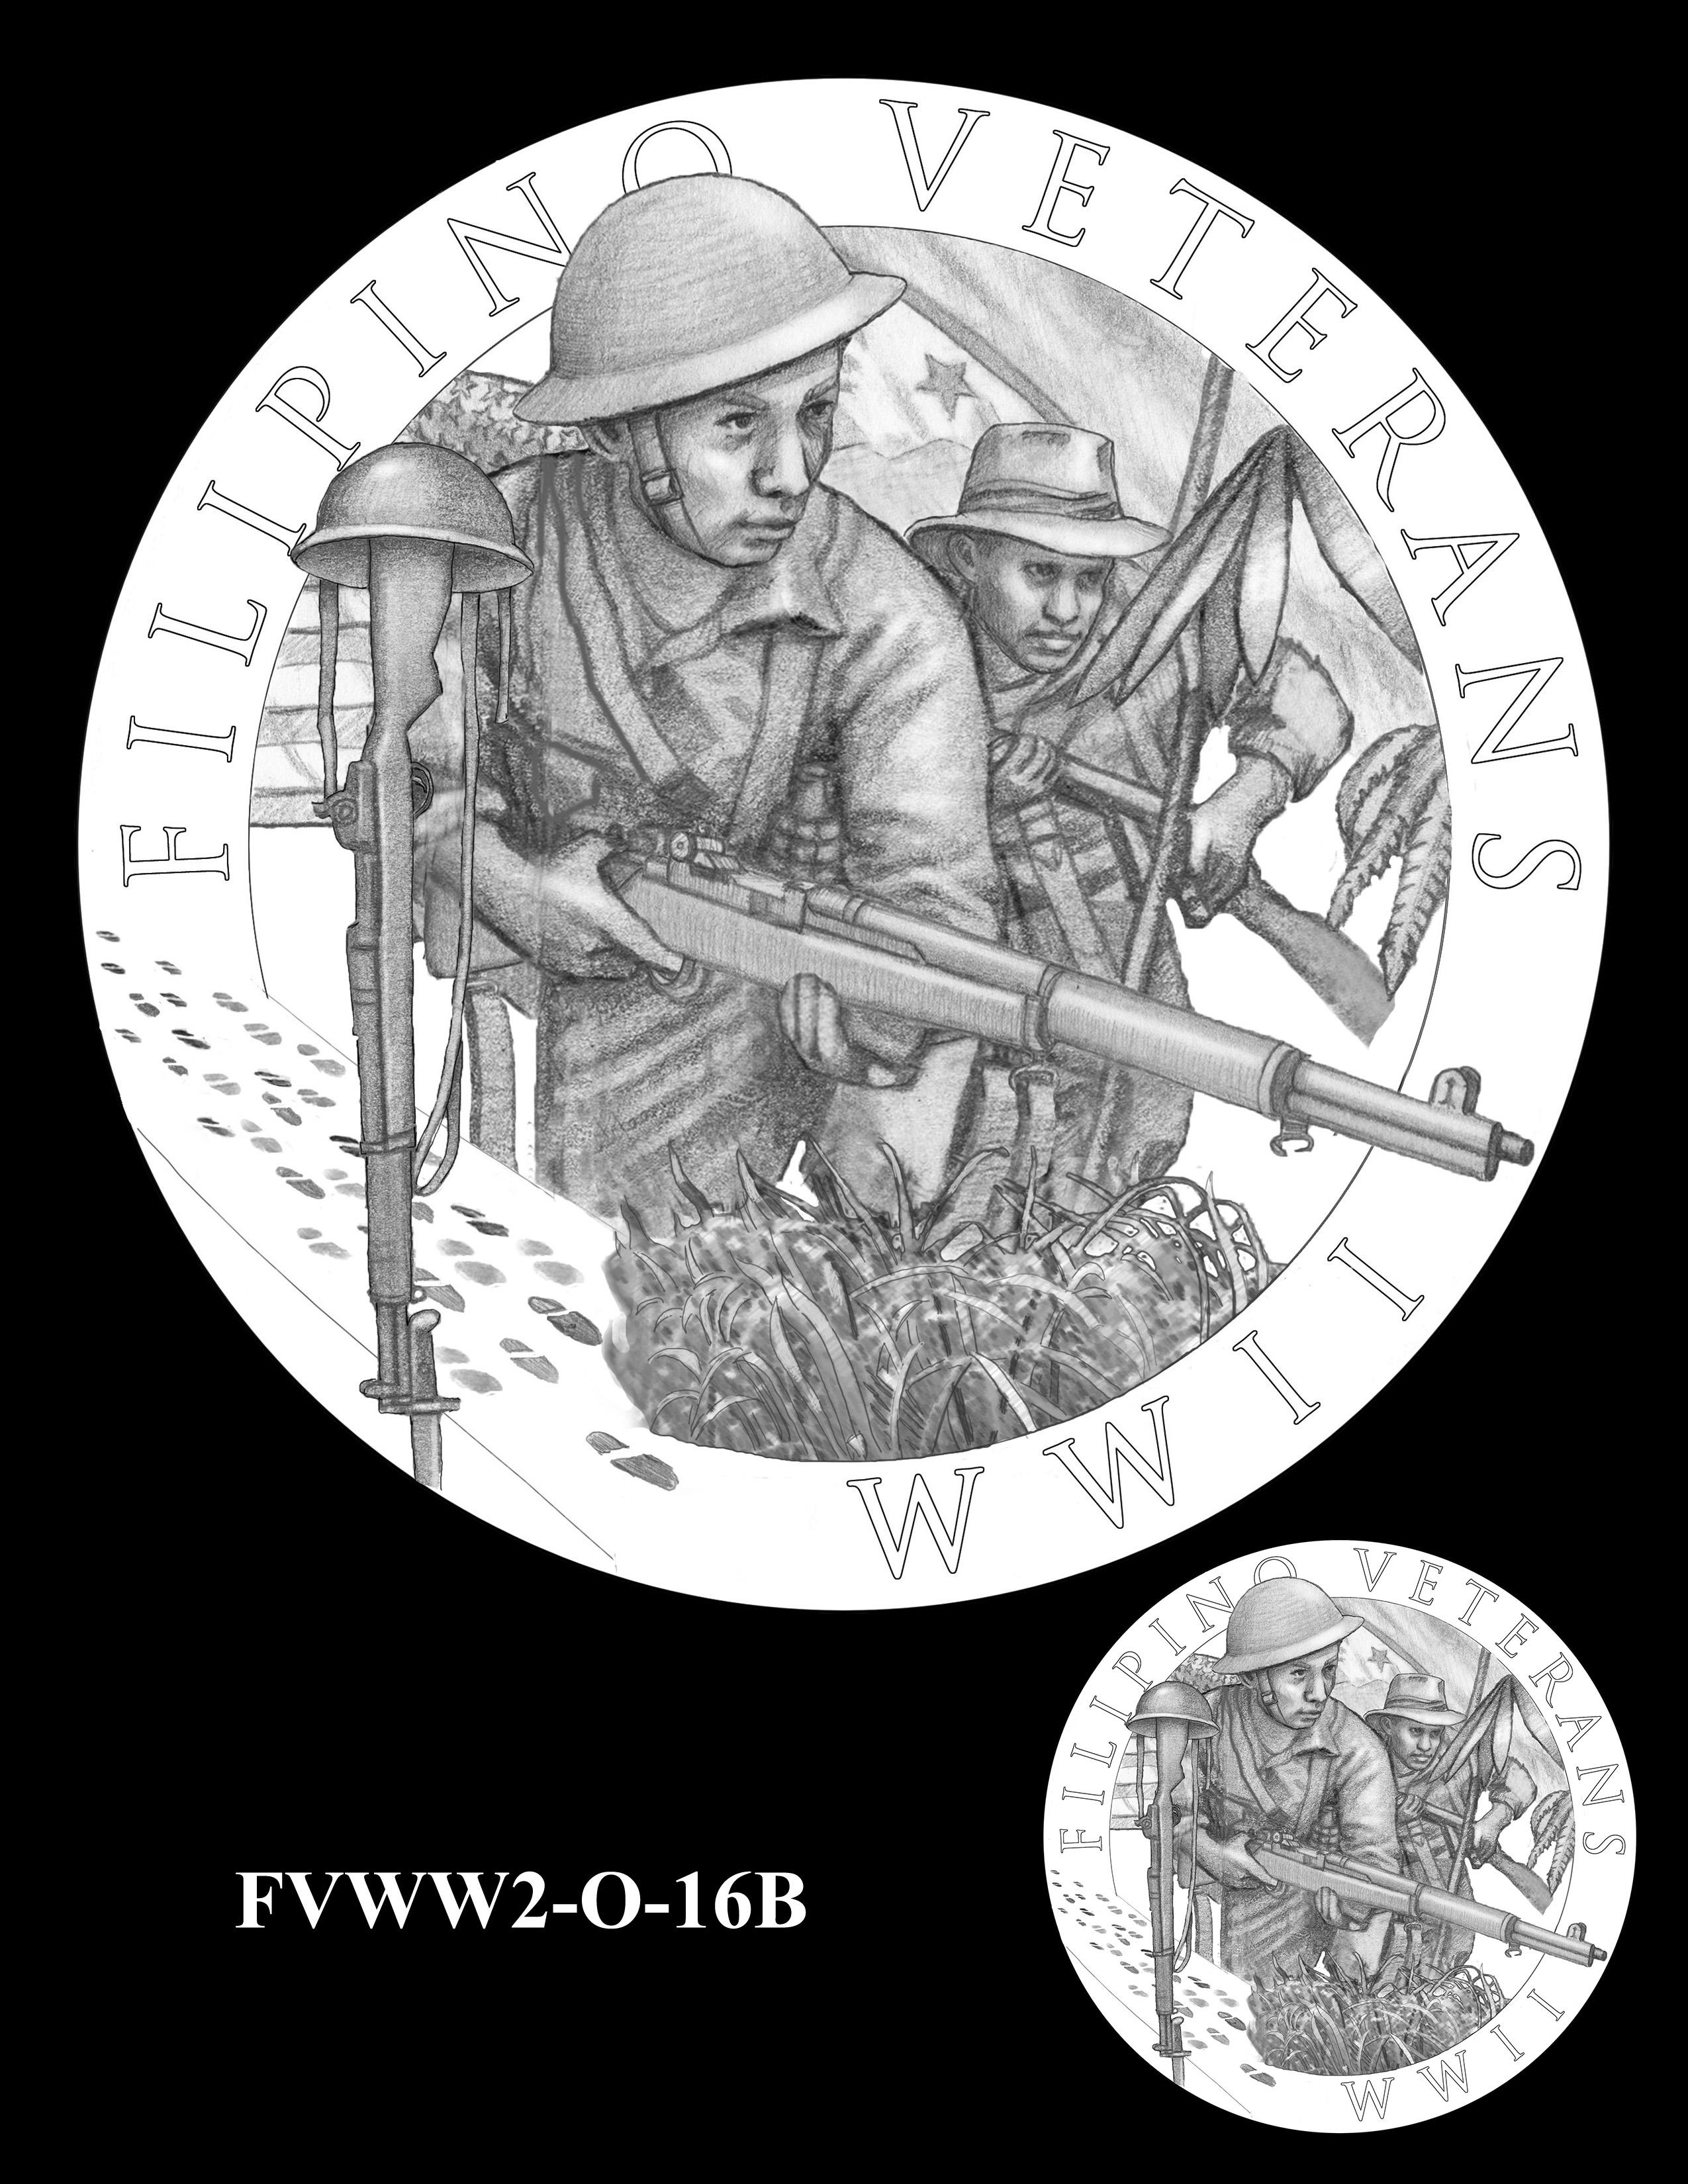 FVWW2-O-16B -- Filipino Veterans of World War II Congressional Gold Medal